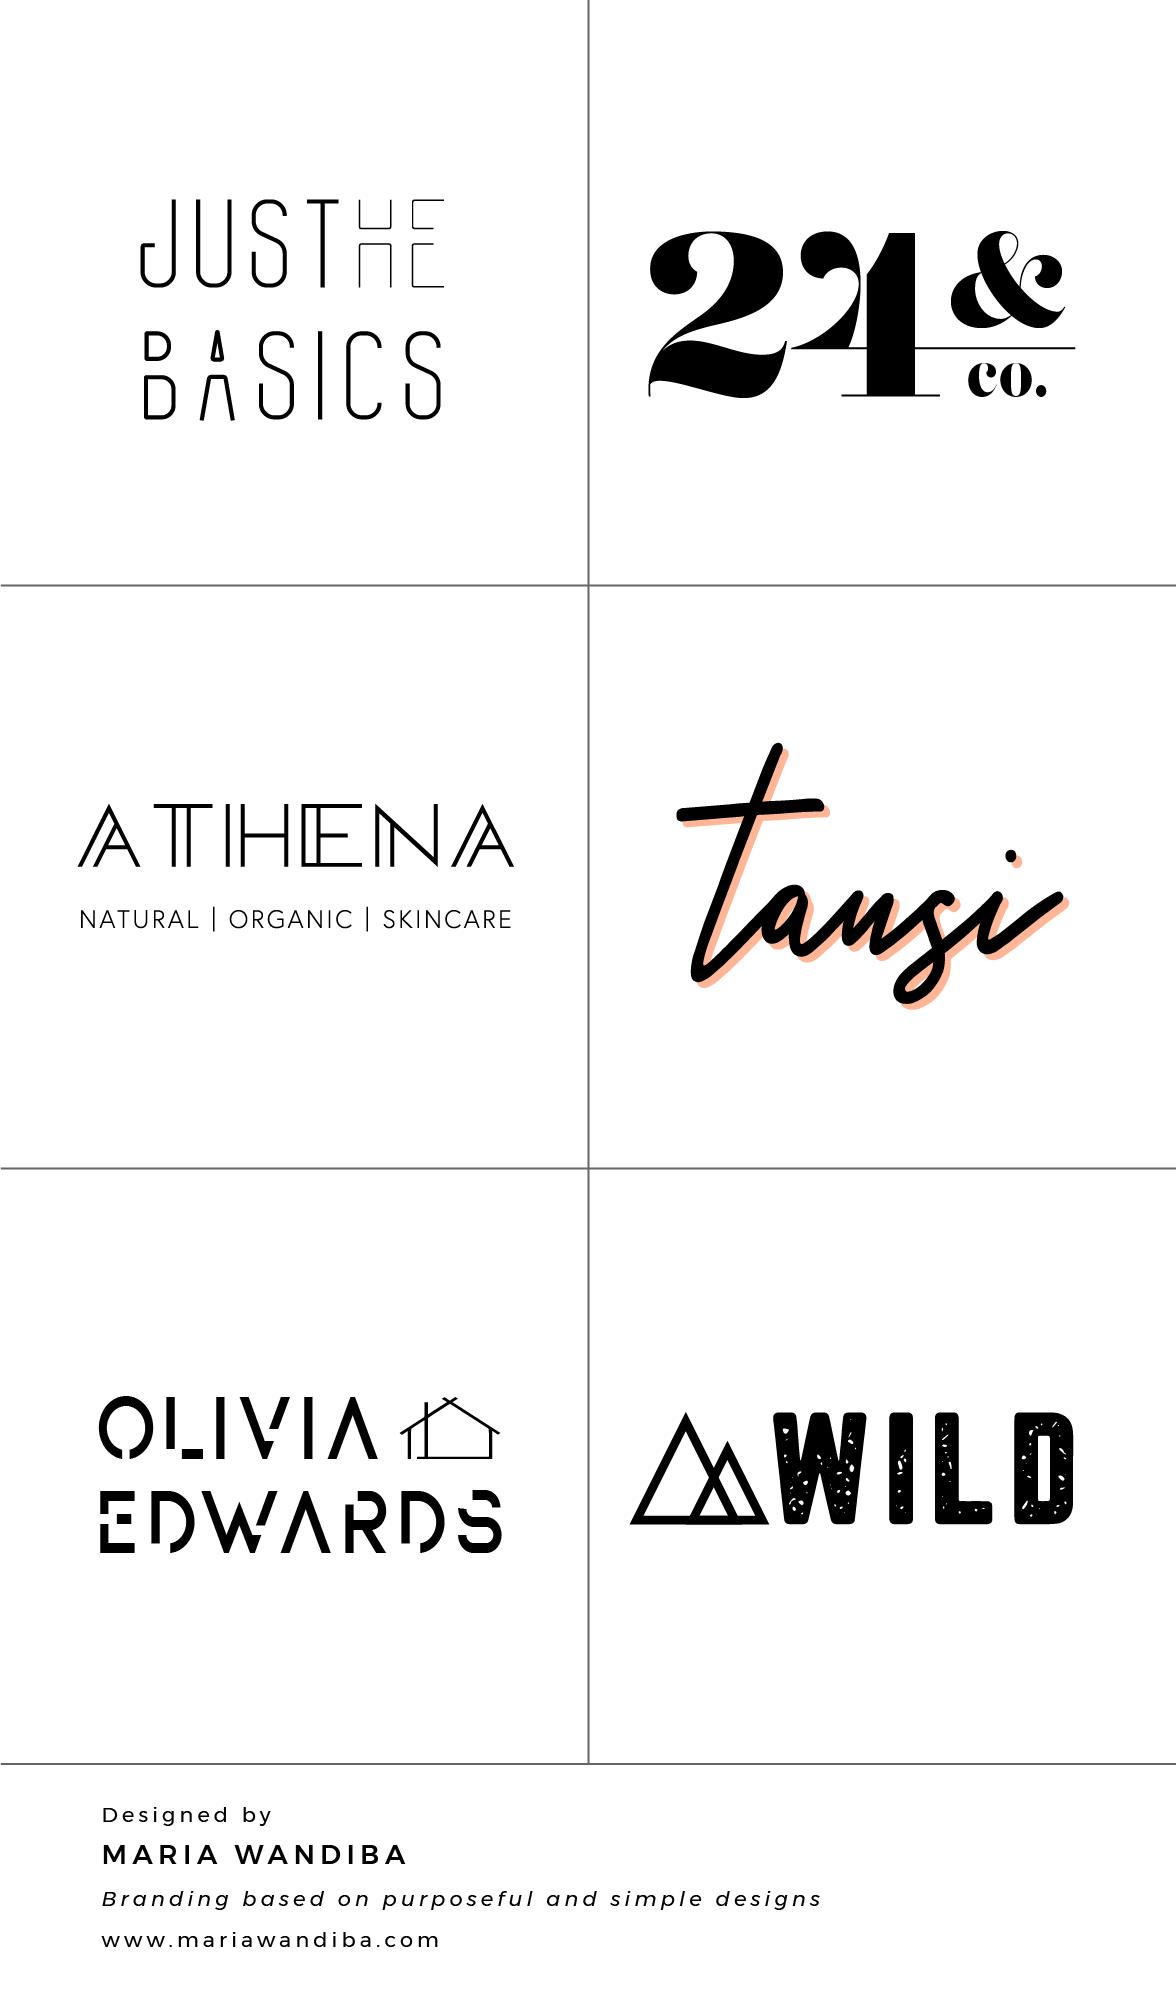 Logo Design By Maria Wandiba Maria Wandiba Design Branding